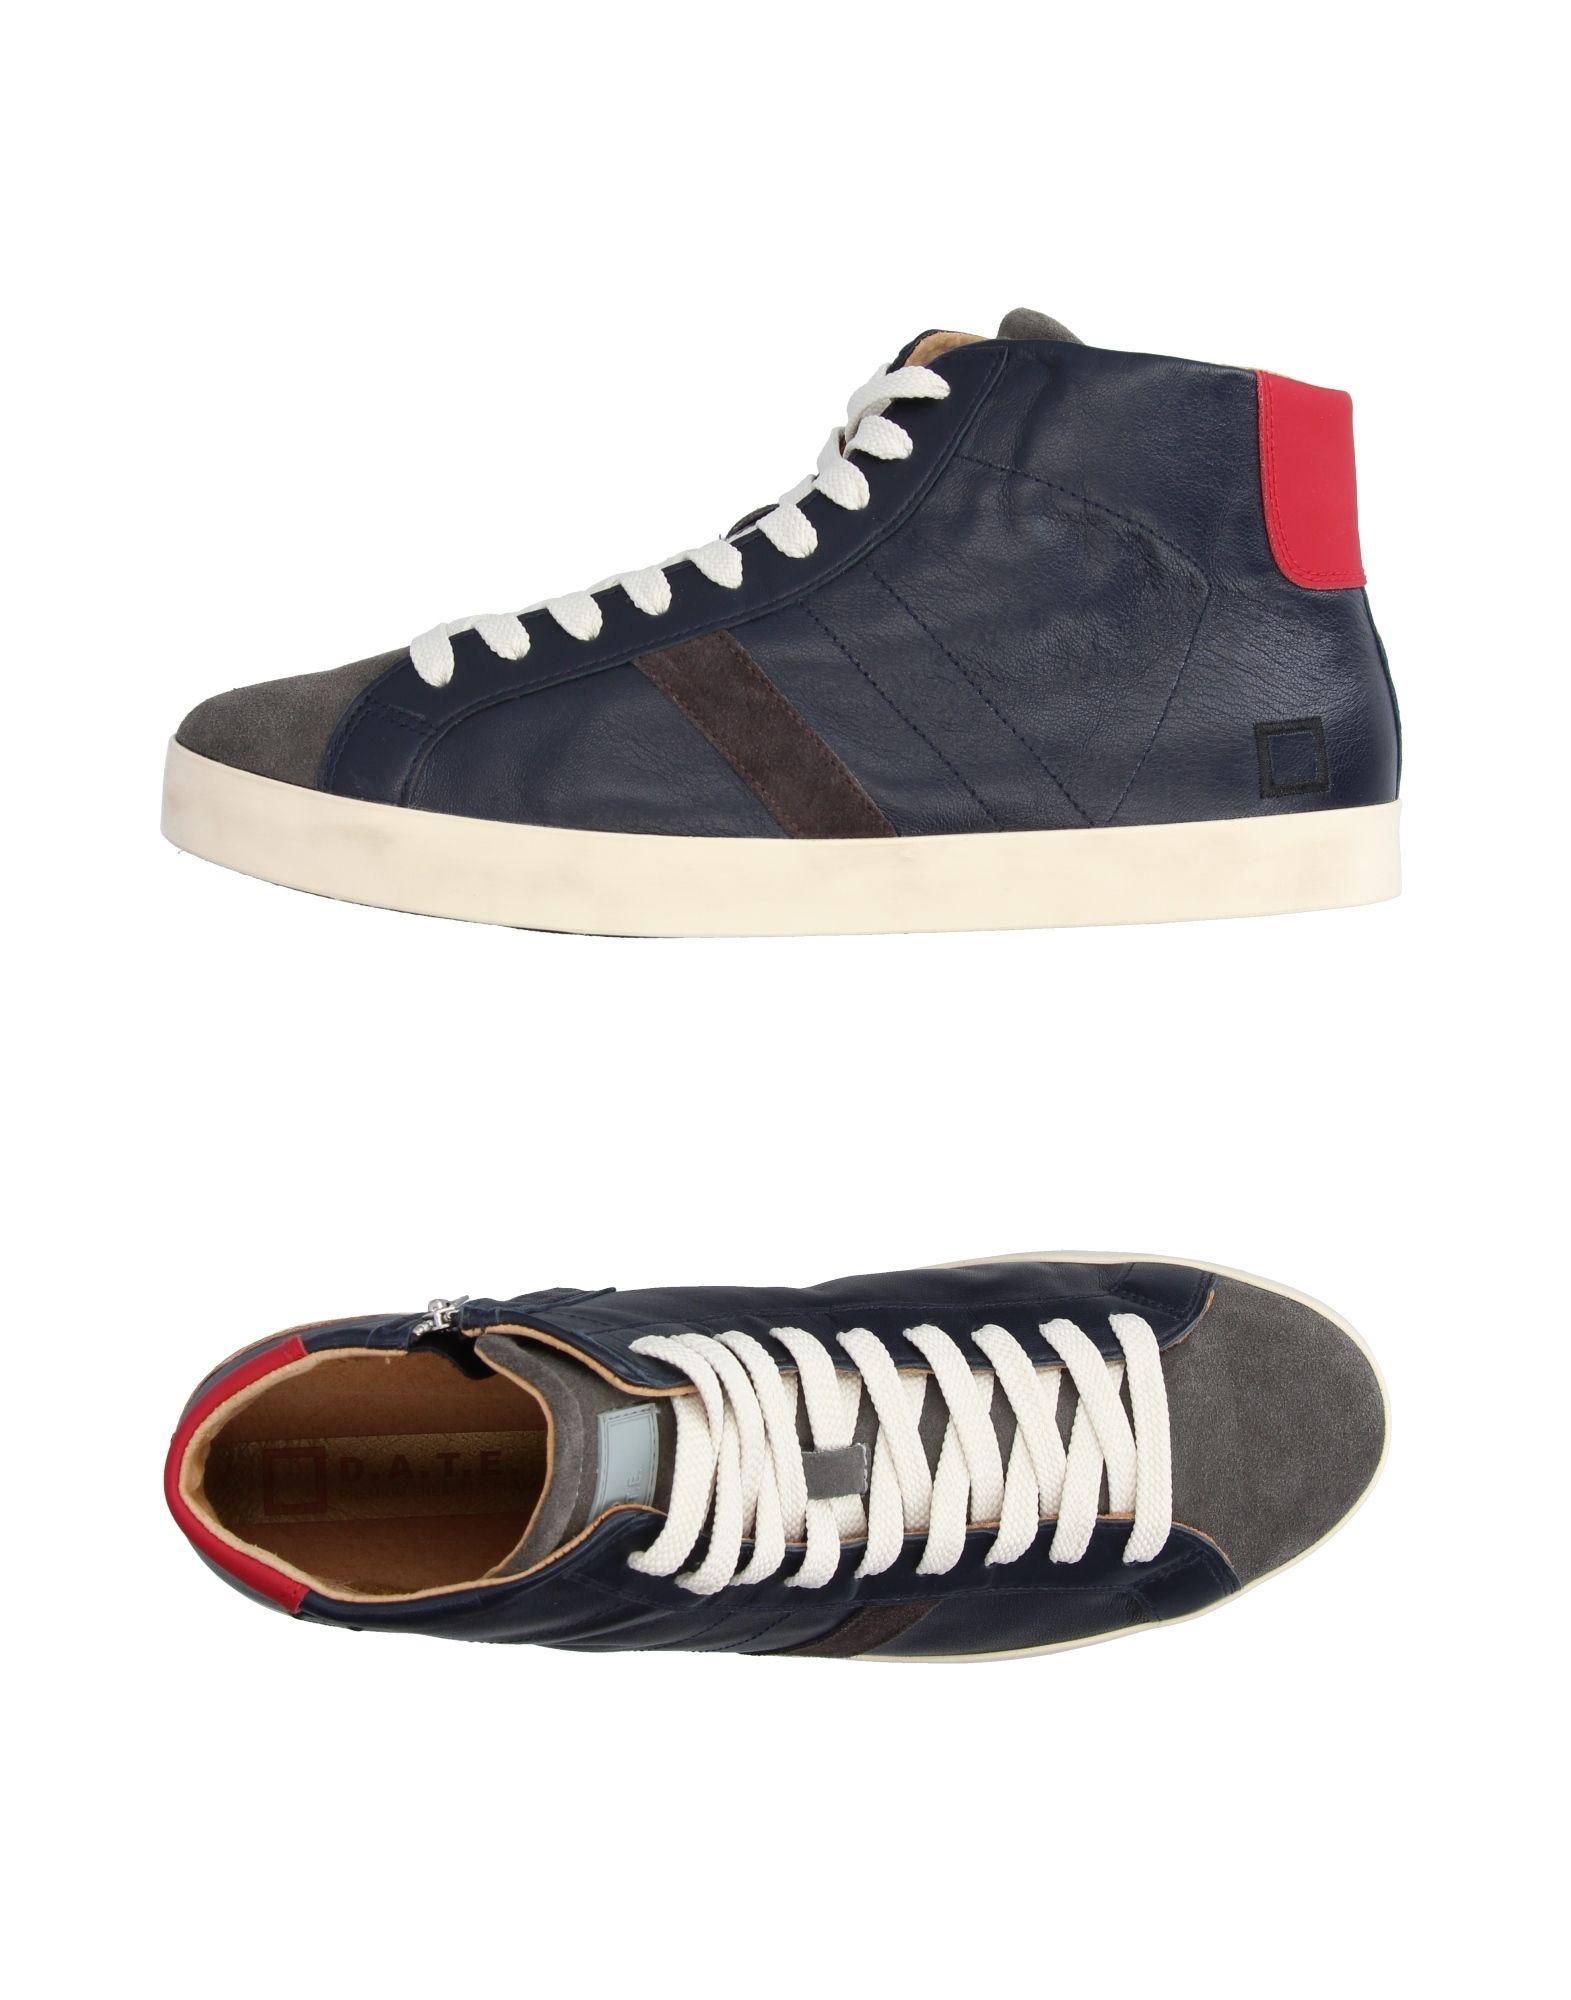 Rabatt echte Sneakers Schuhe D.A.T.E. Sneakers echte Herren  11211715FU b055bc